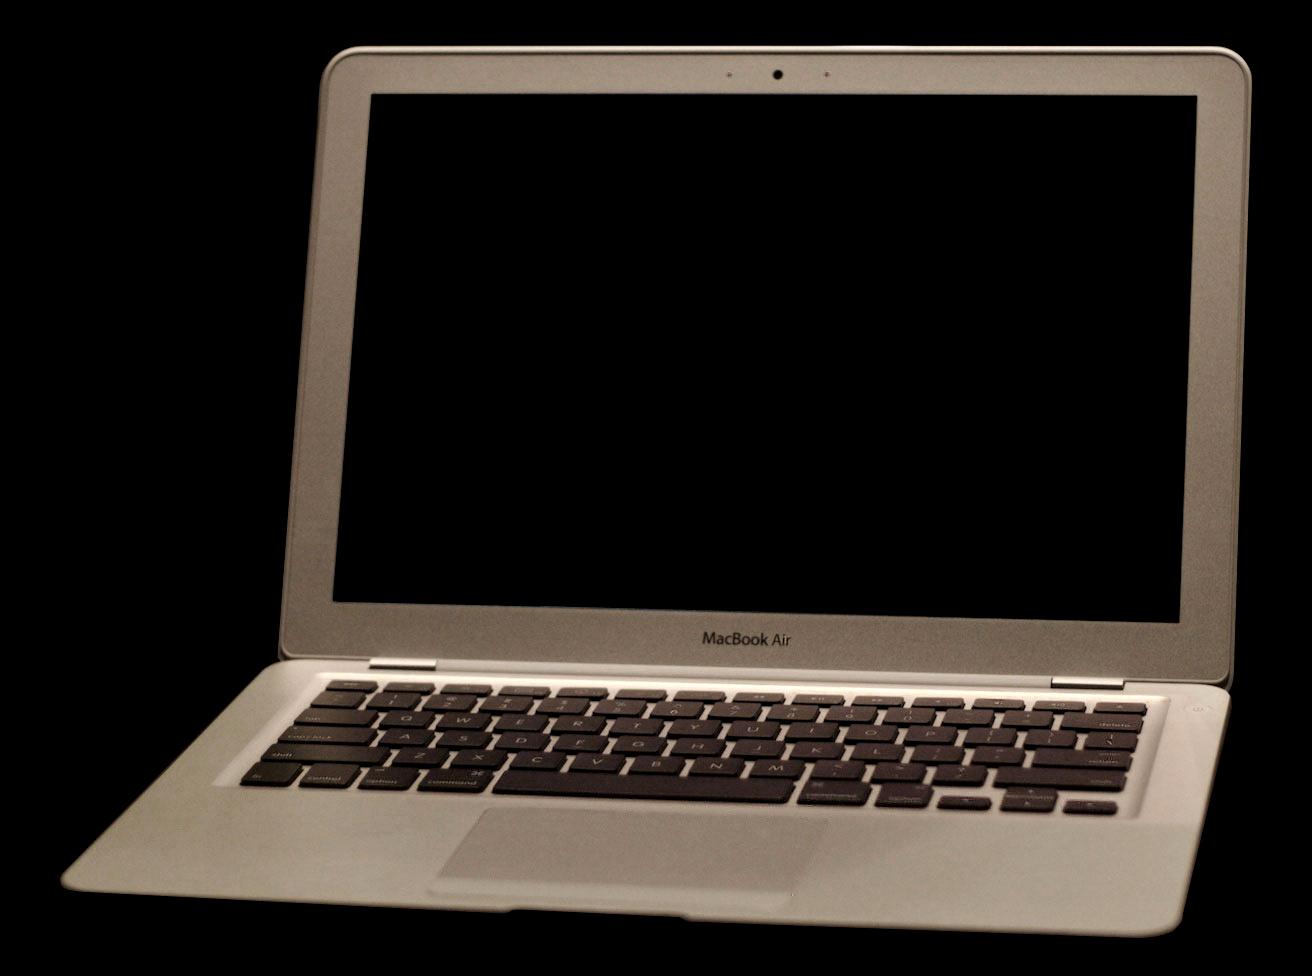 Macbook Png Image Macbook Best Laptops Mobile Computing